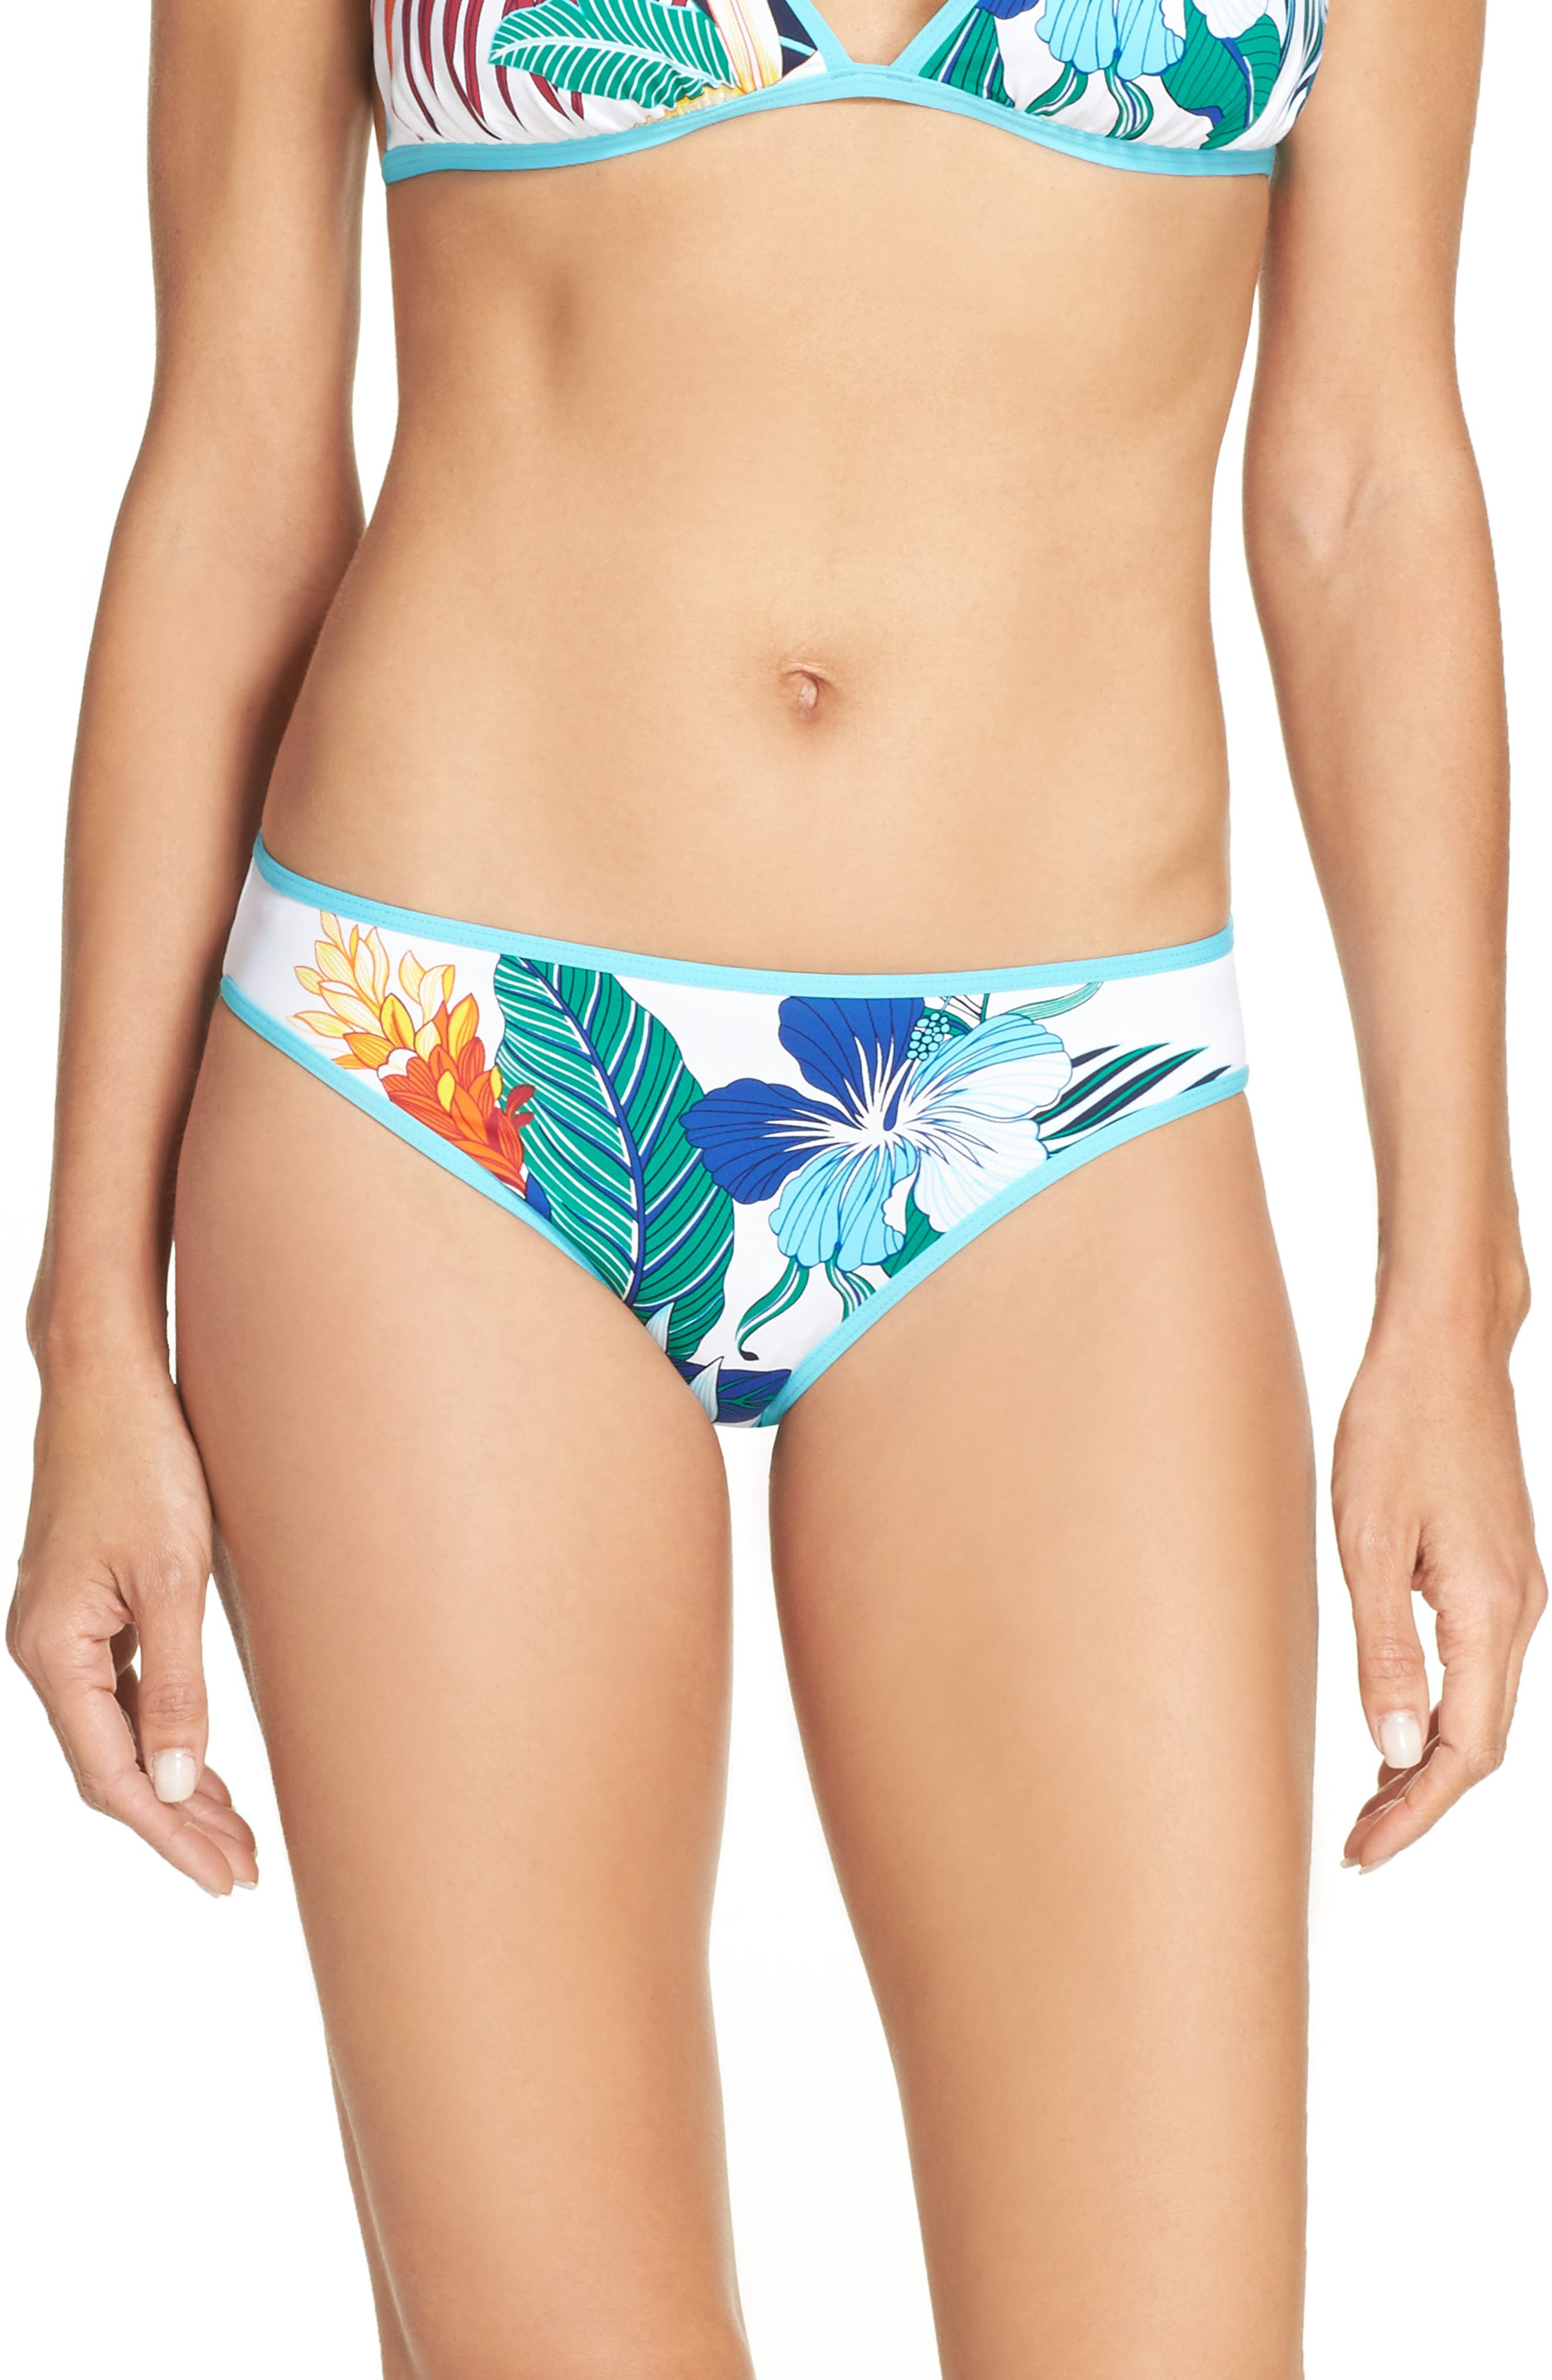 Hibiscus Print Bikini Bottoms,                         Main,                         color, White